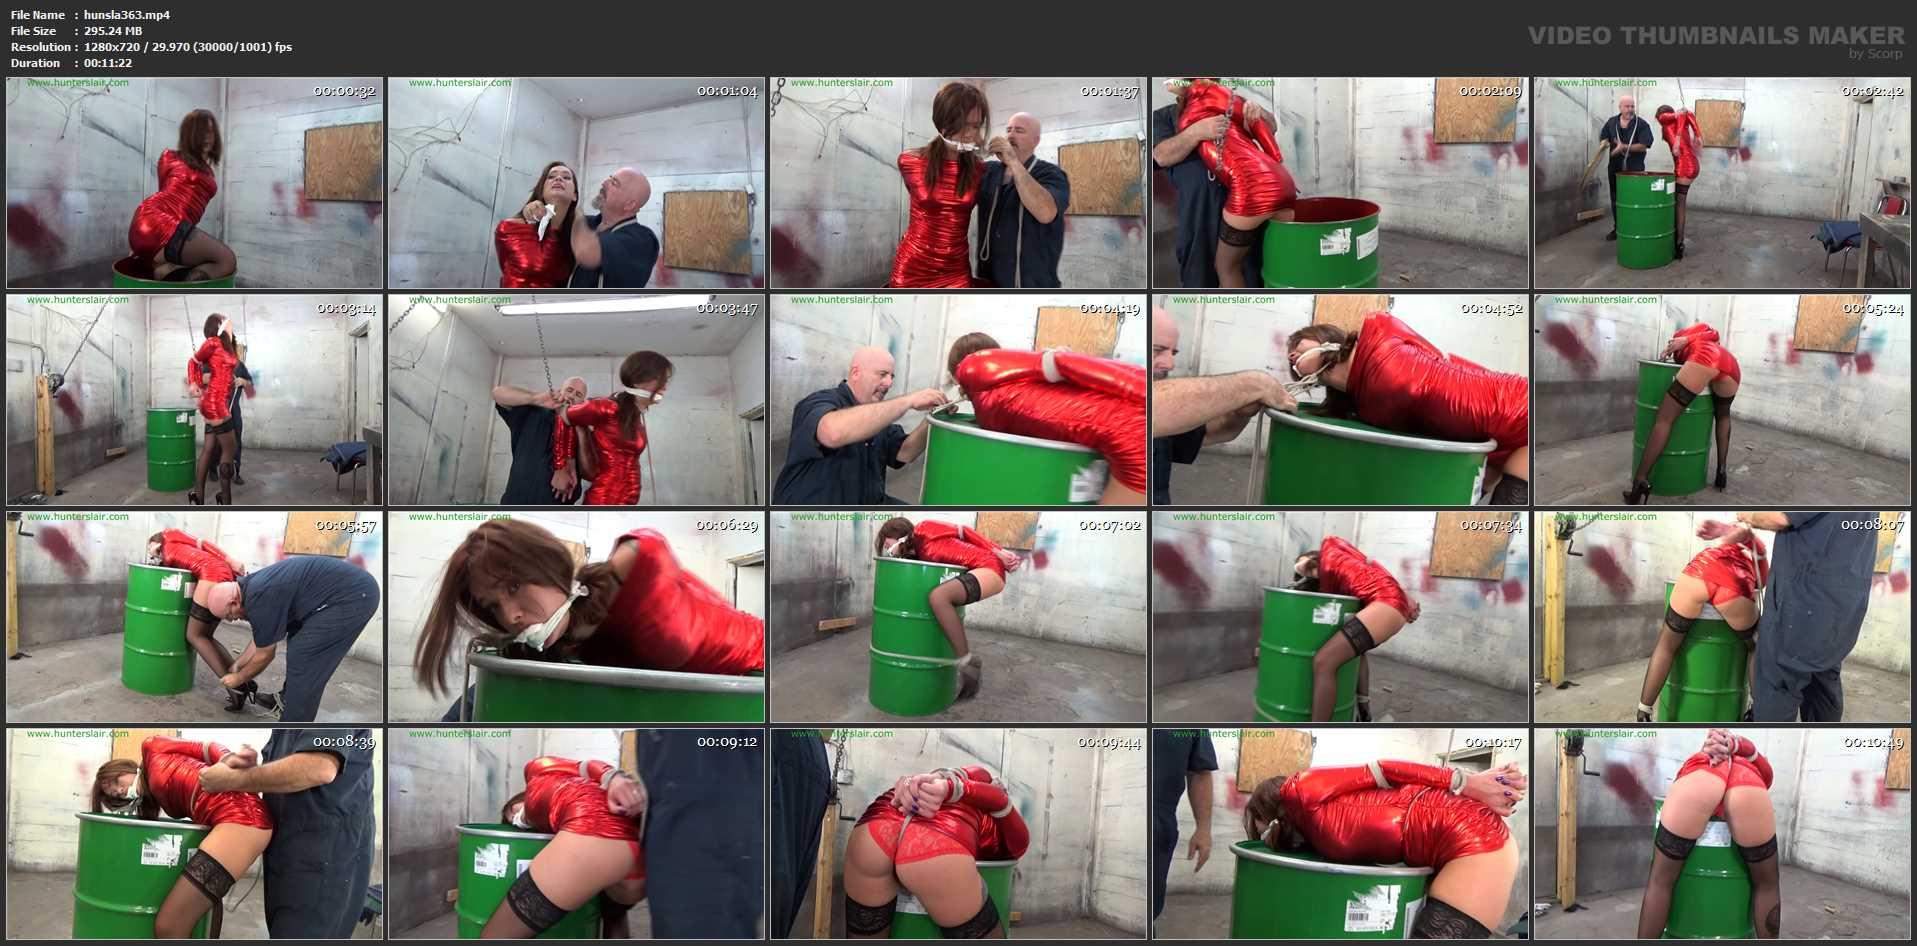 [HUNTERSLAIR] Helpless captive bound over a barrel. Featuring: Maria Marley [HD][720p][MP4]